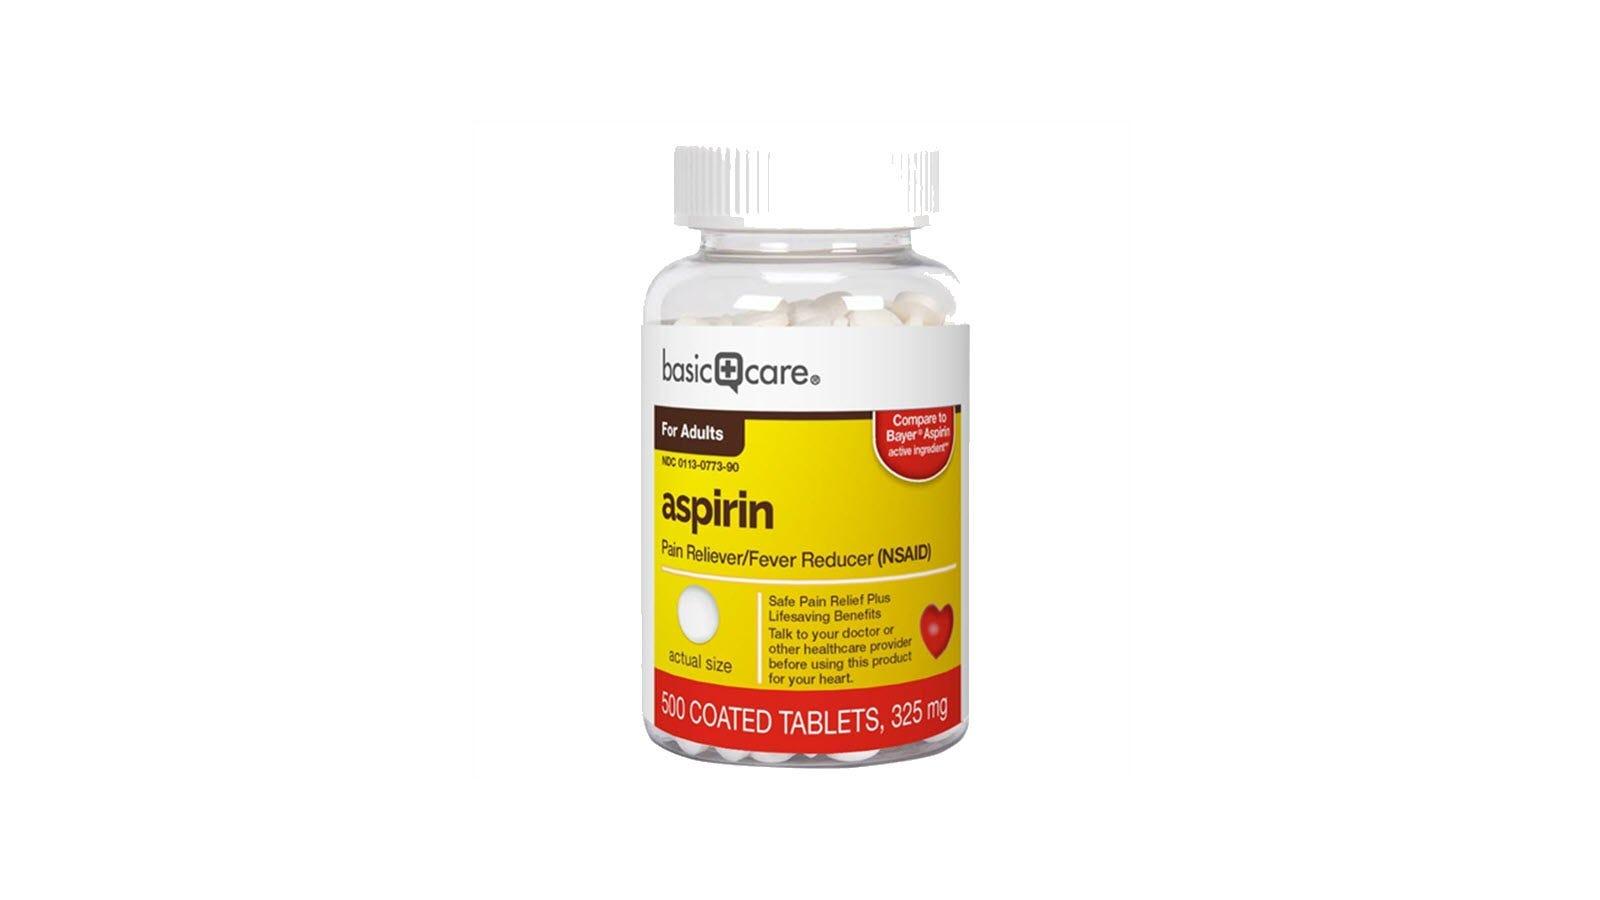 A bottle of Basic Care brand aspirin.